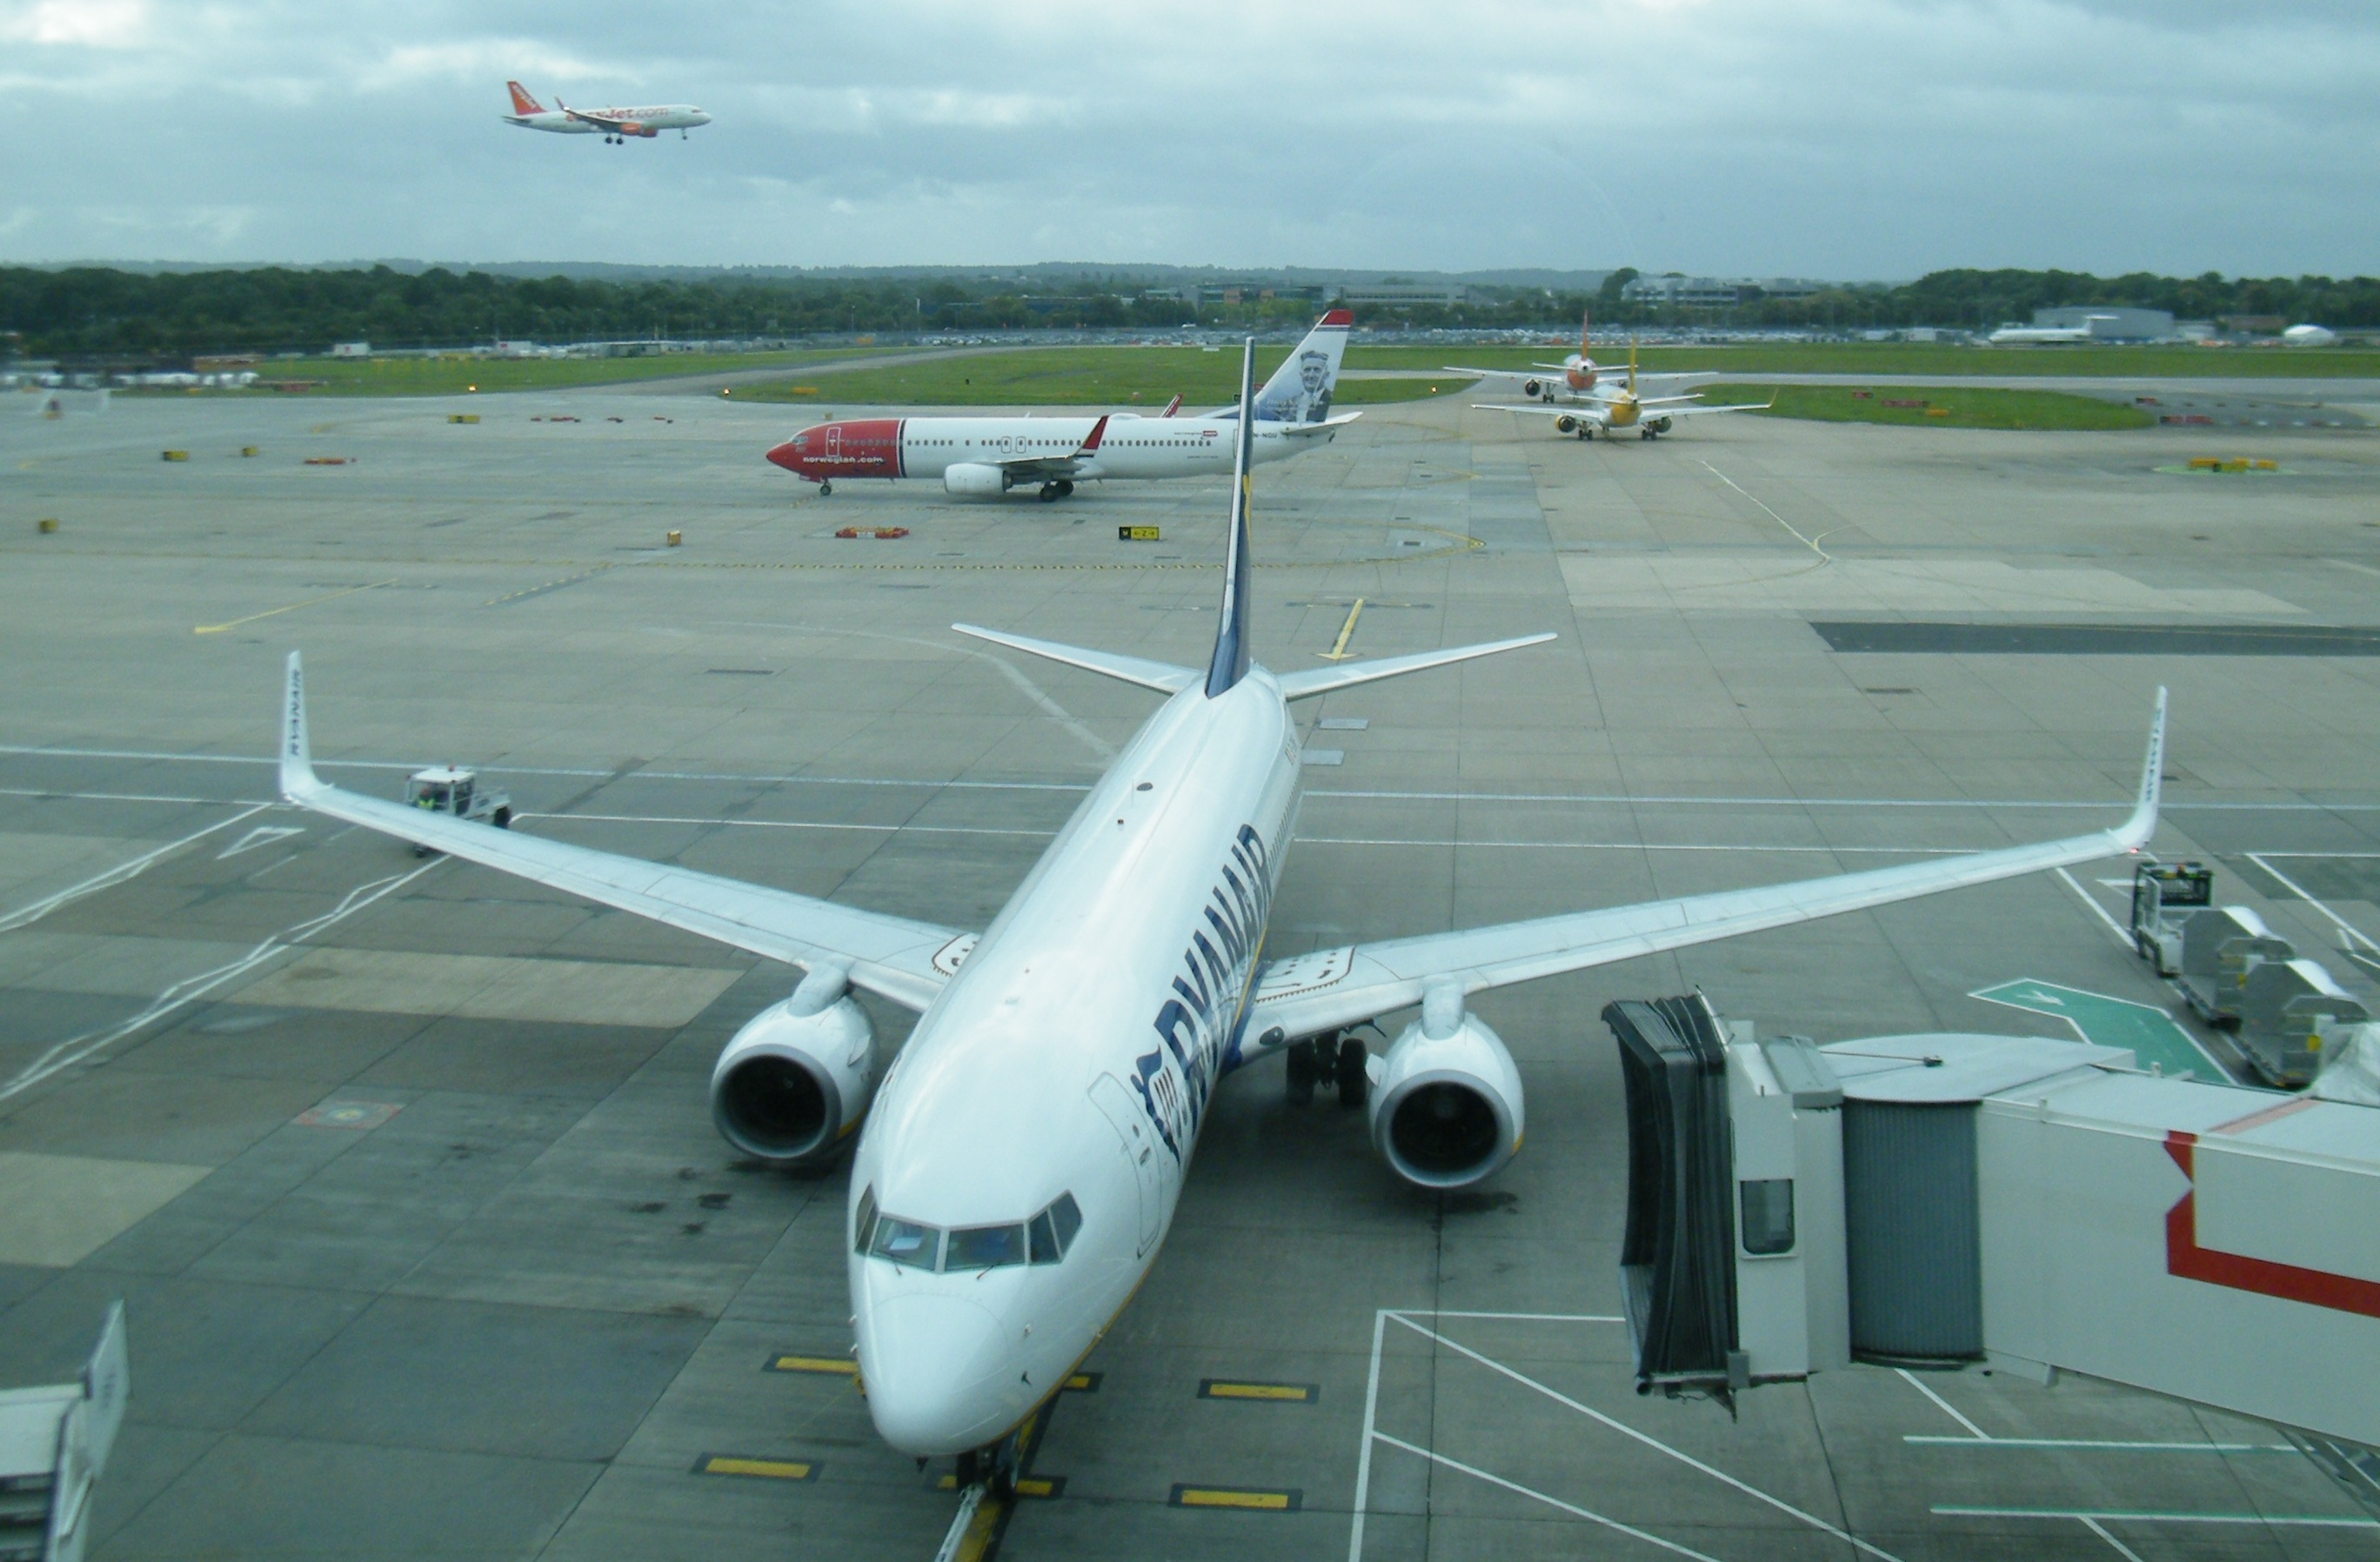 Ryanair i London Gatwick, i baggrunden ruller Norwegian. Foto: Henrik Baumgarten.